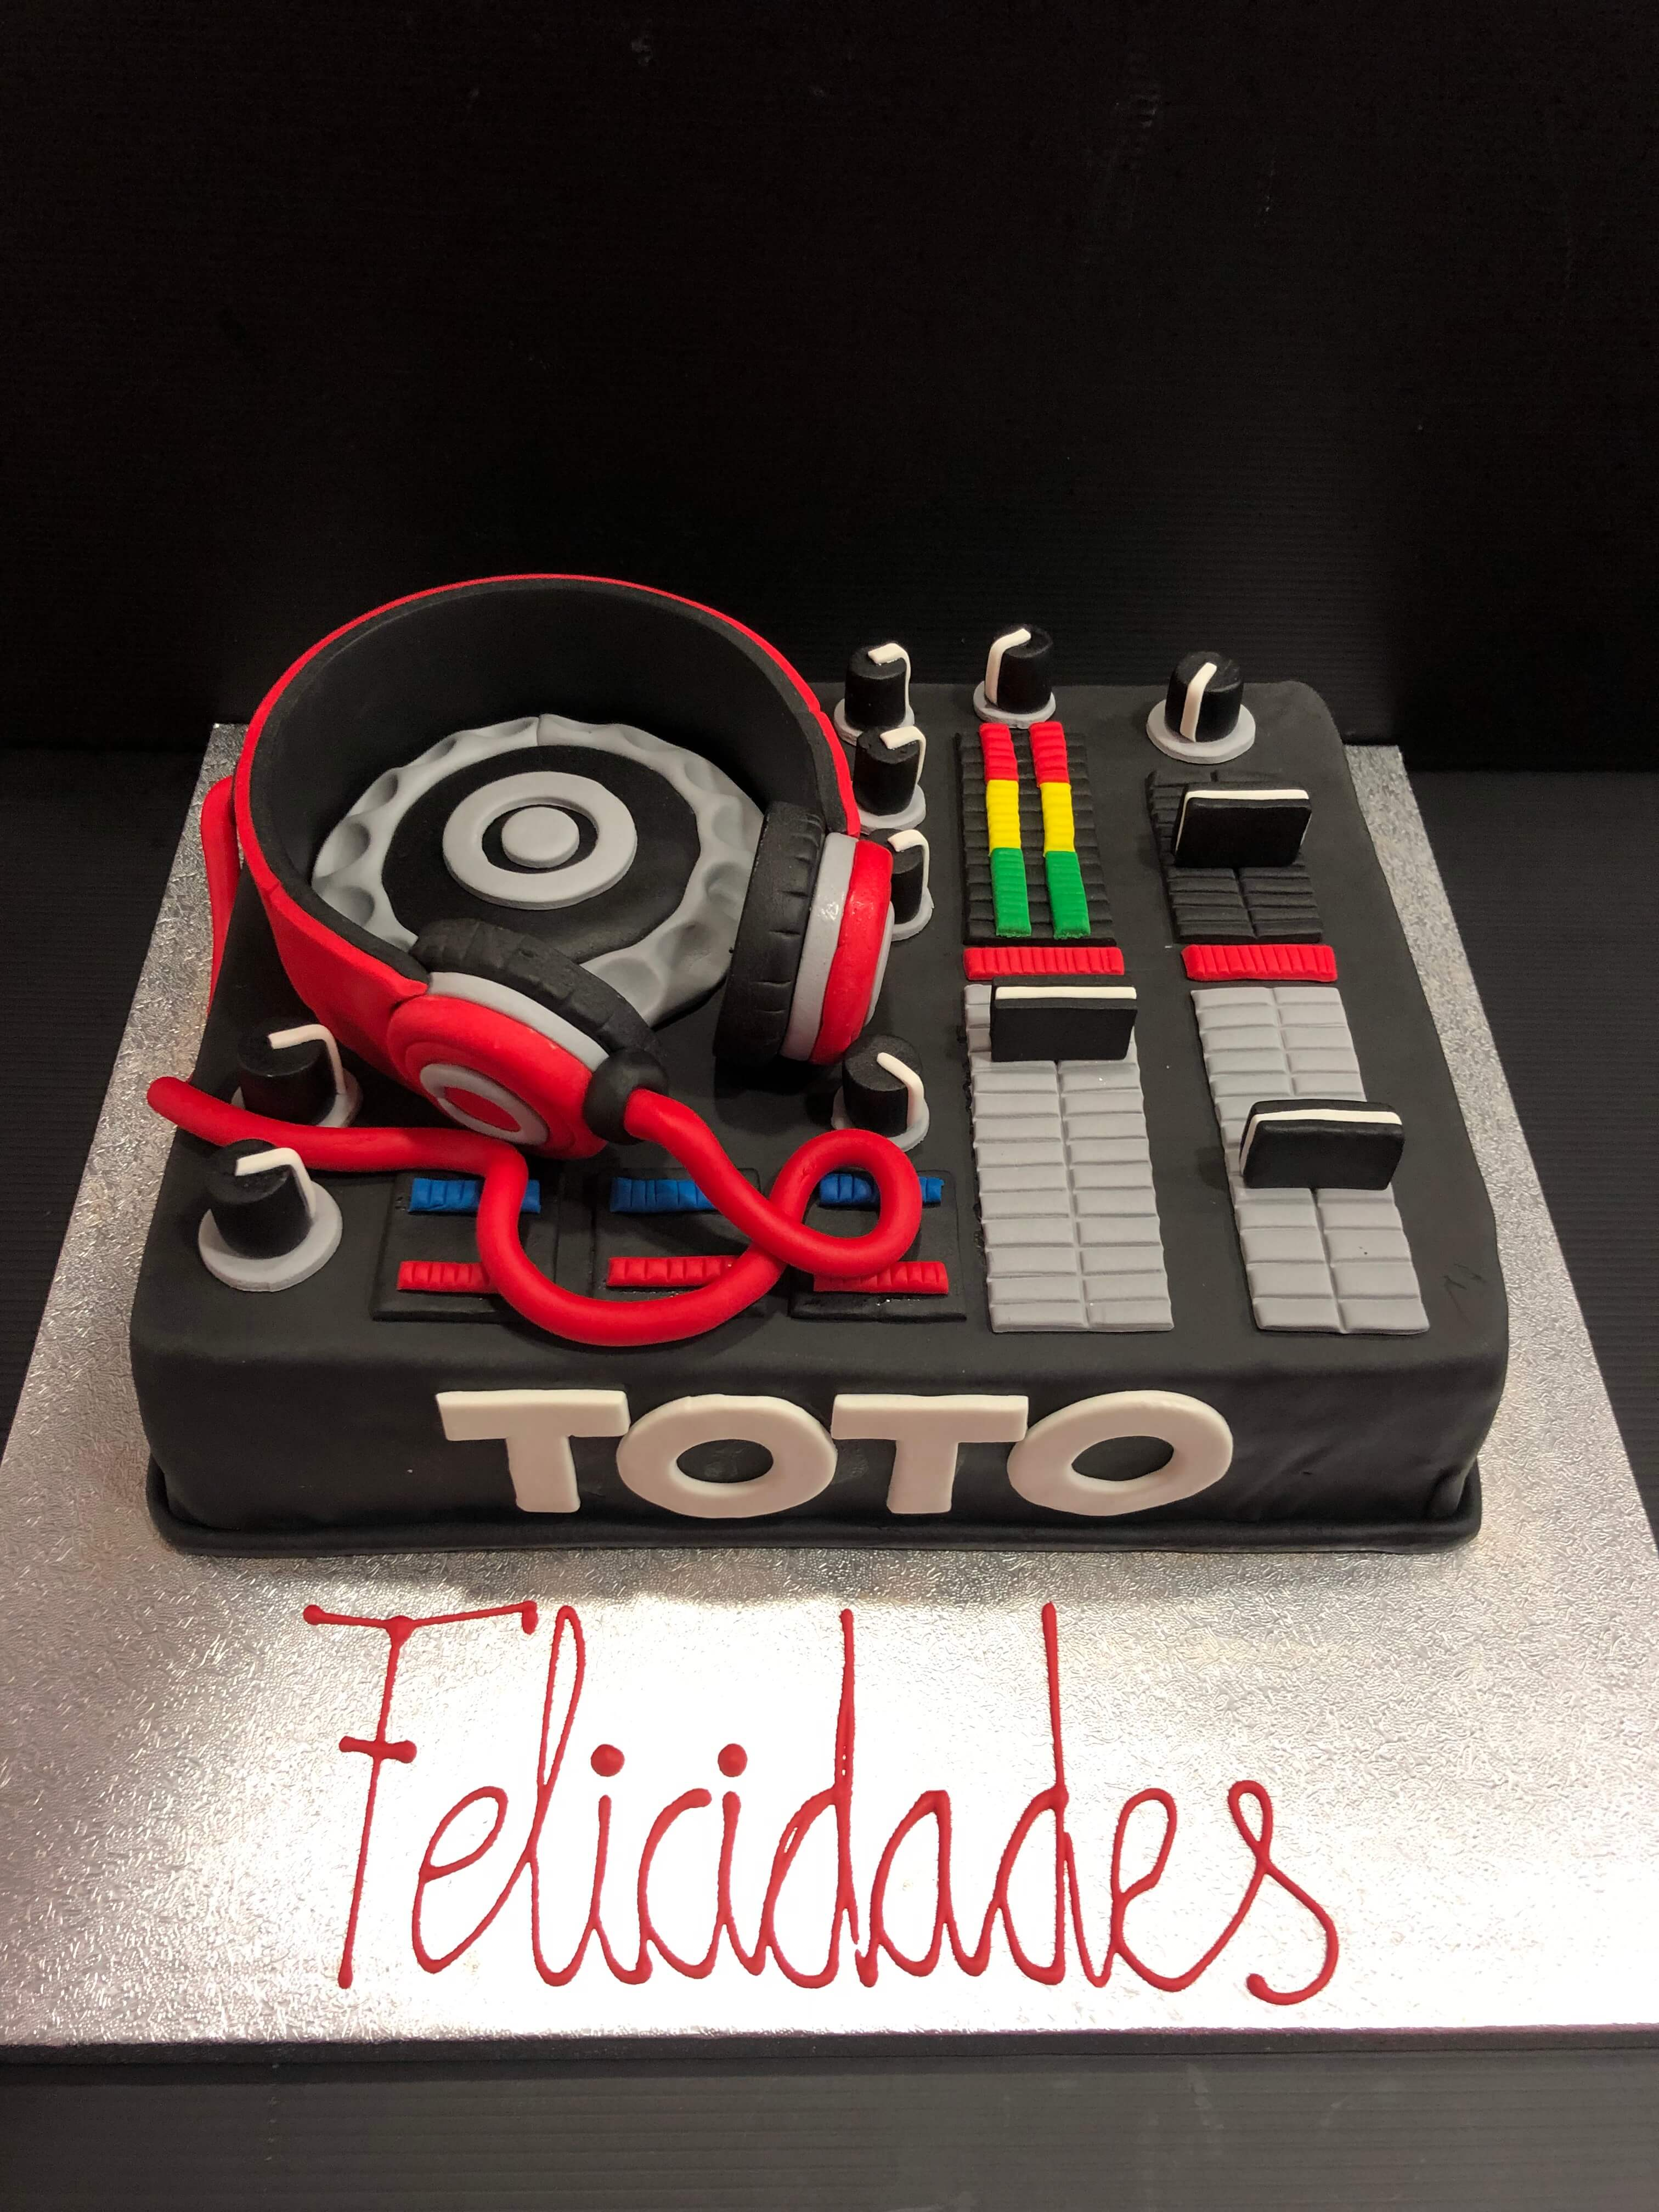 Cumpleaños tarta personalizada dj mesa de mezclas coruña